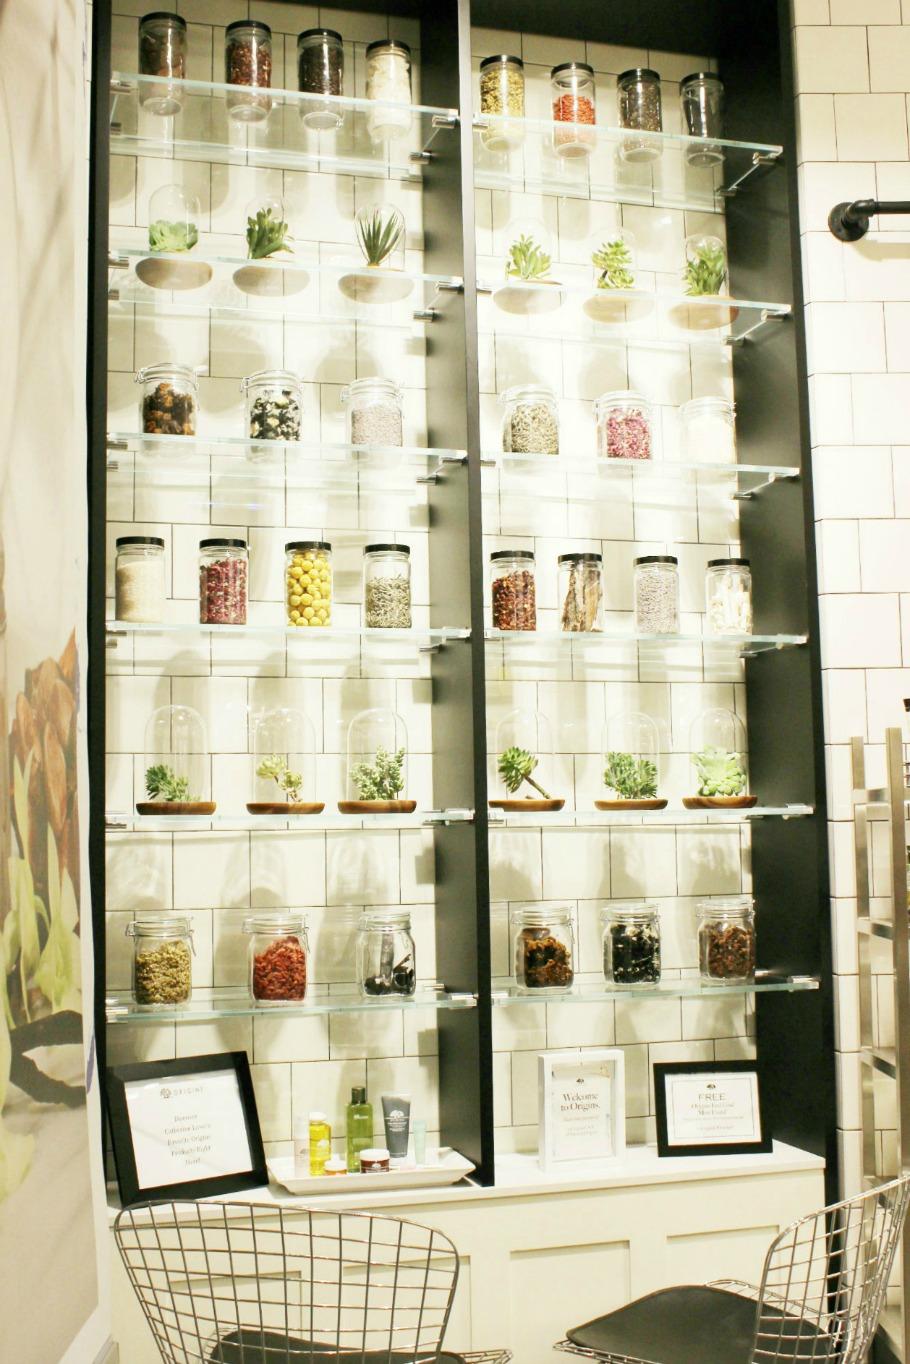 Houston Galleria Origins Store Re-Opening | Brighterdarling.com